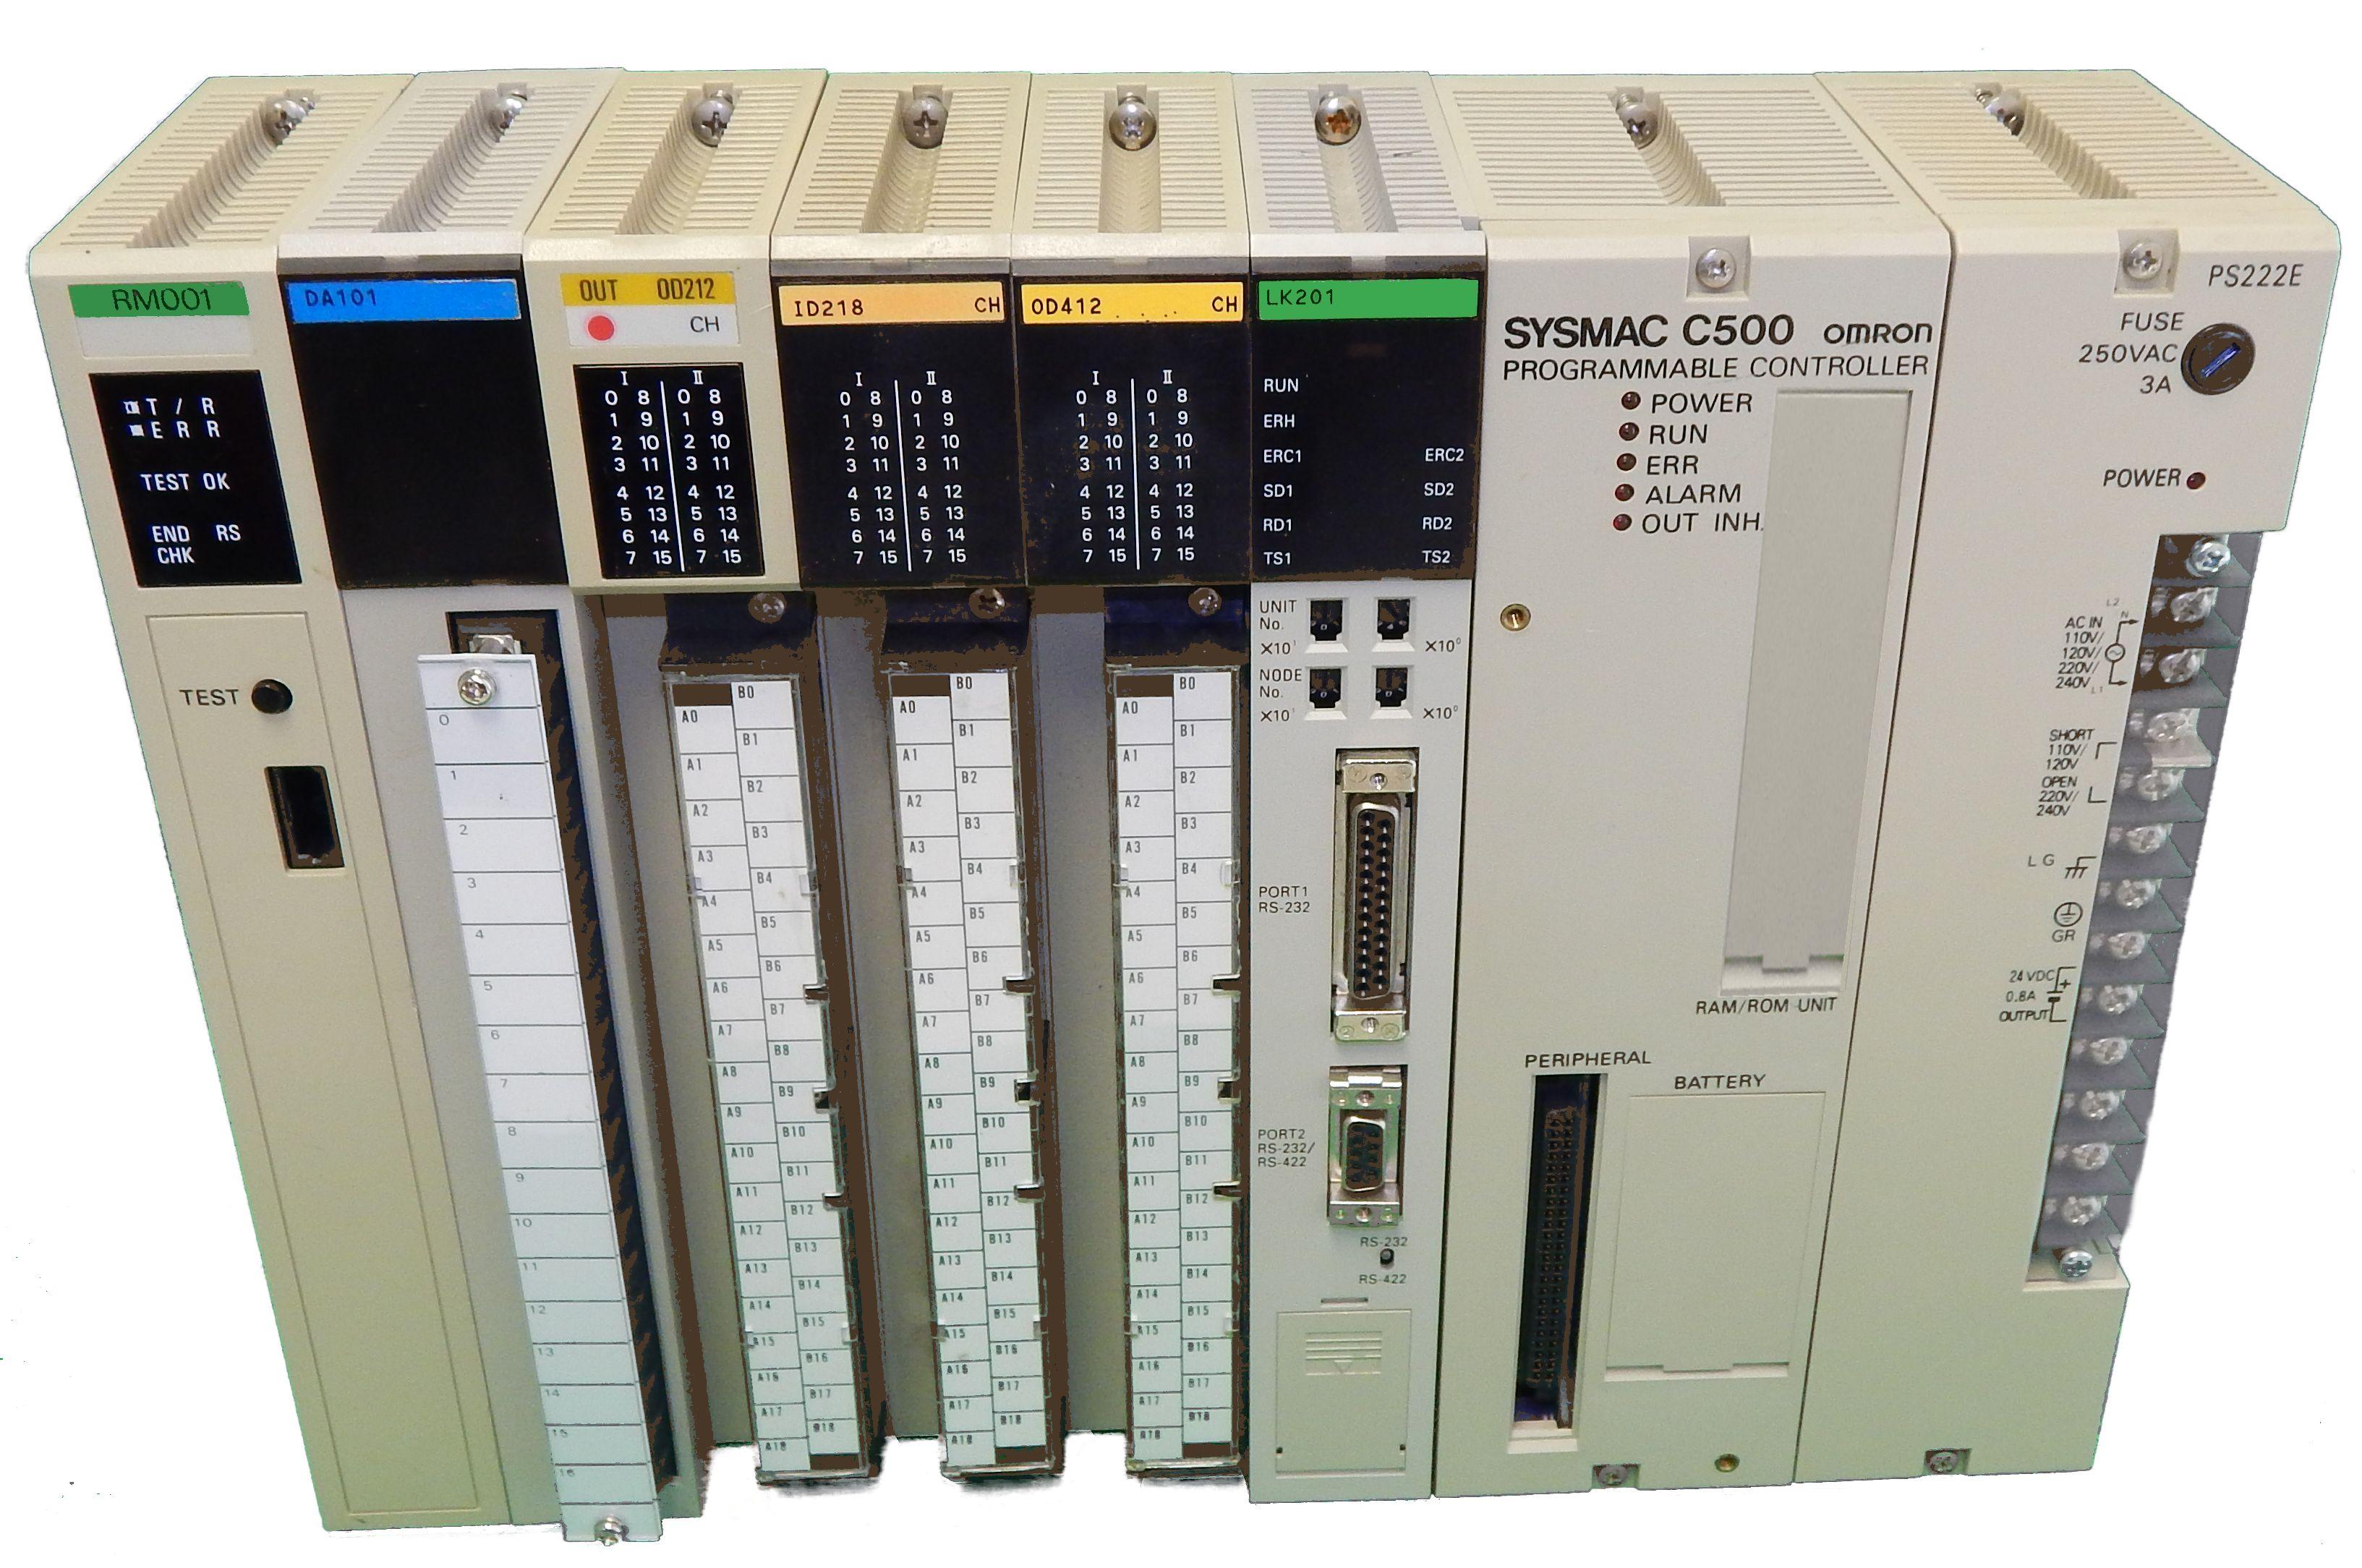 3G2C7-CPU38-E